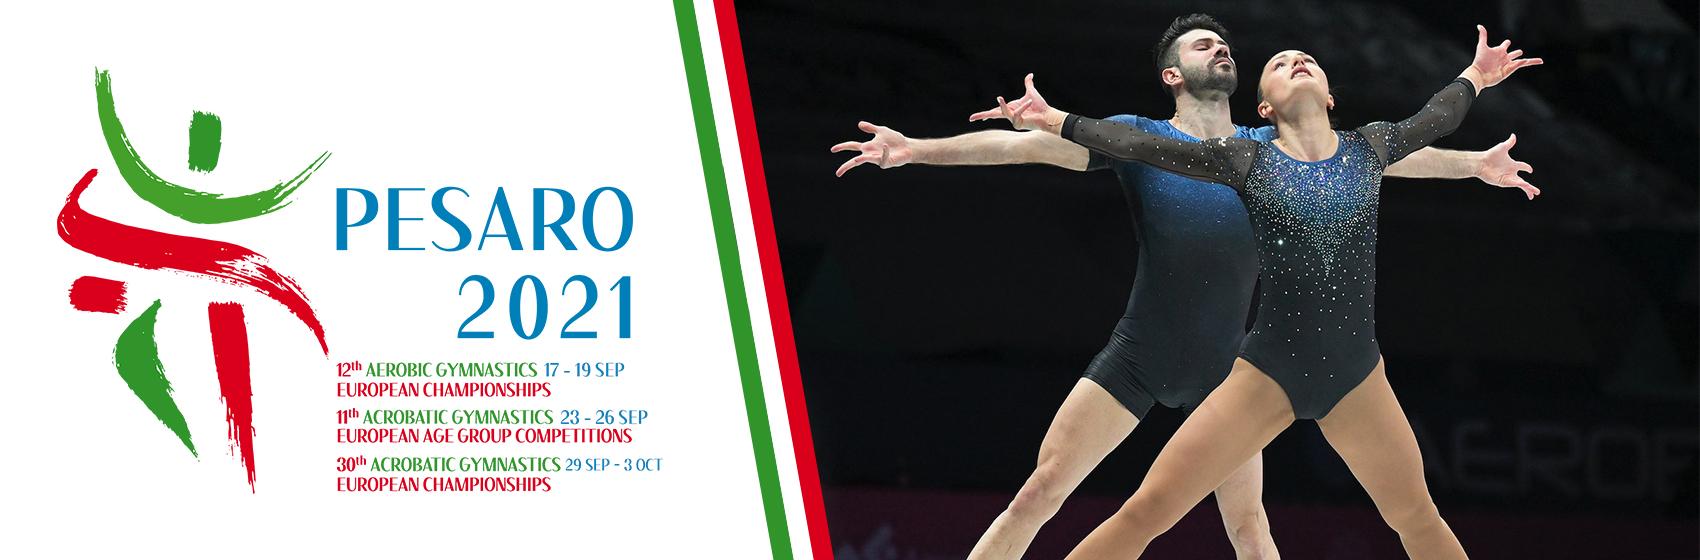 Campionati europei ginnastica locandina